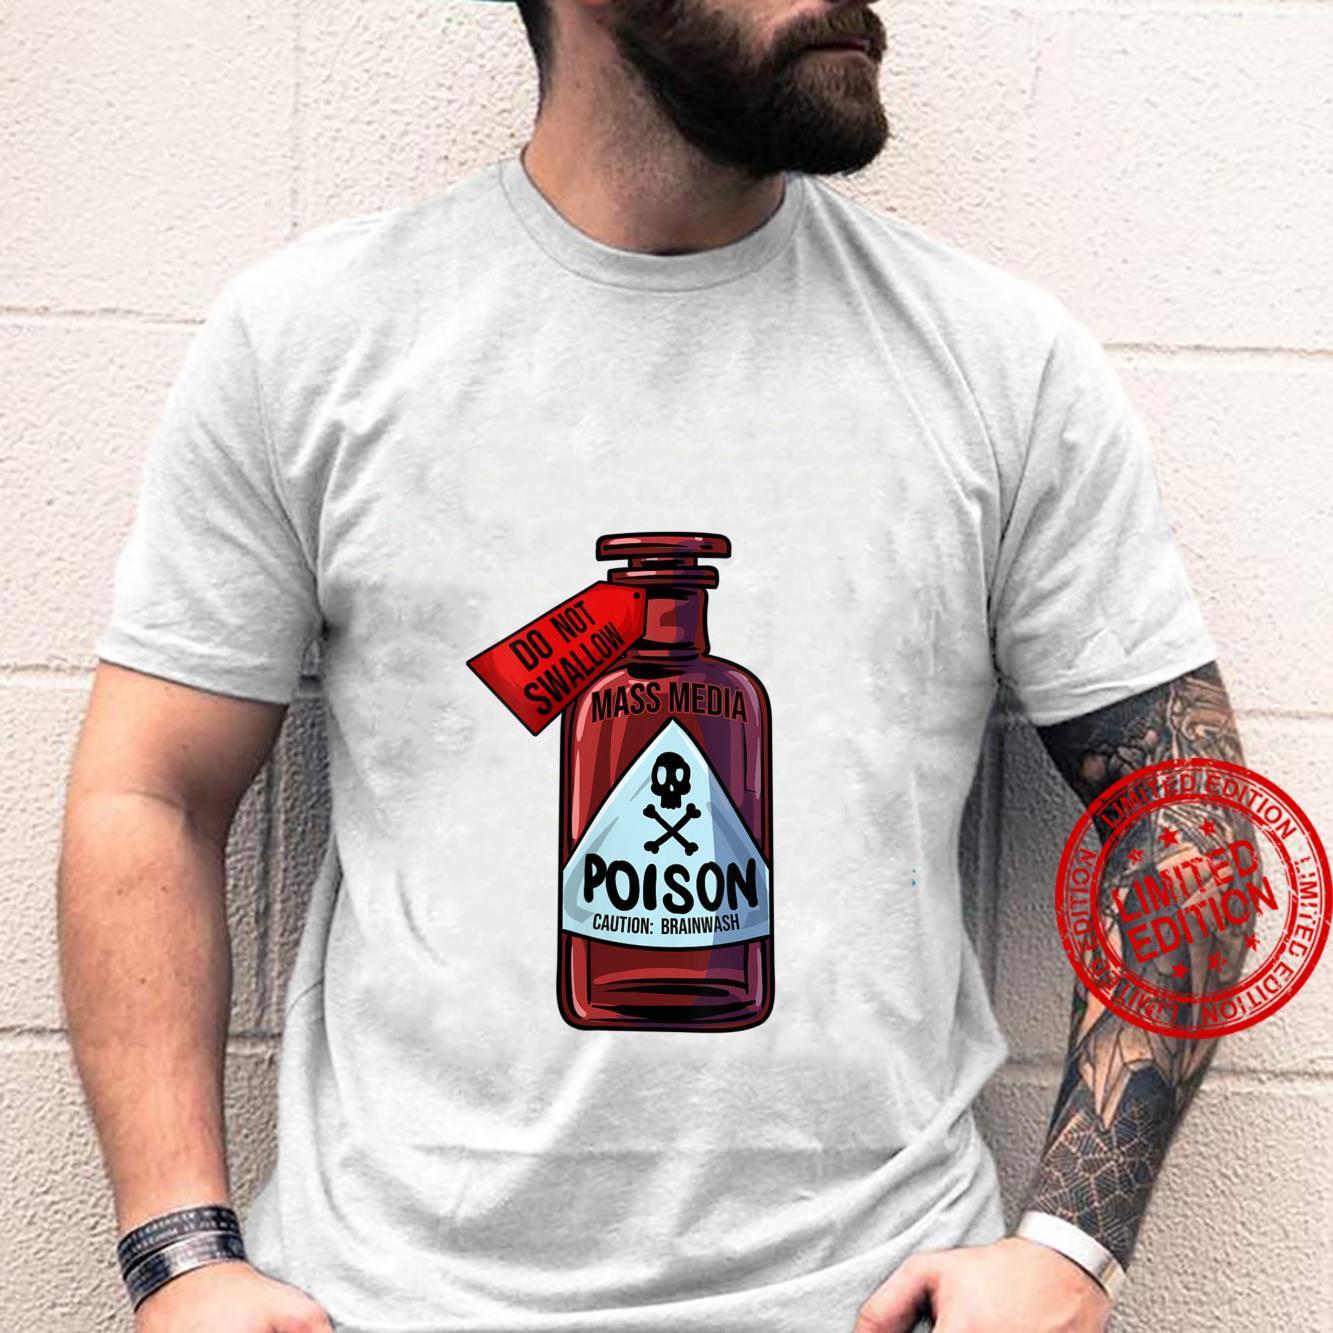 Womens Poison Bottle Mass Media Brainwashing Toxic Shirt